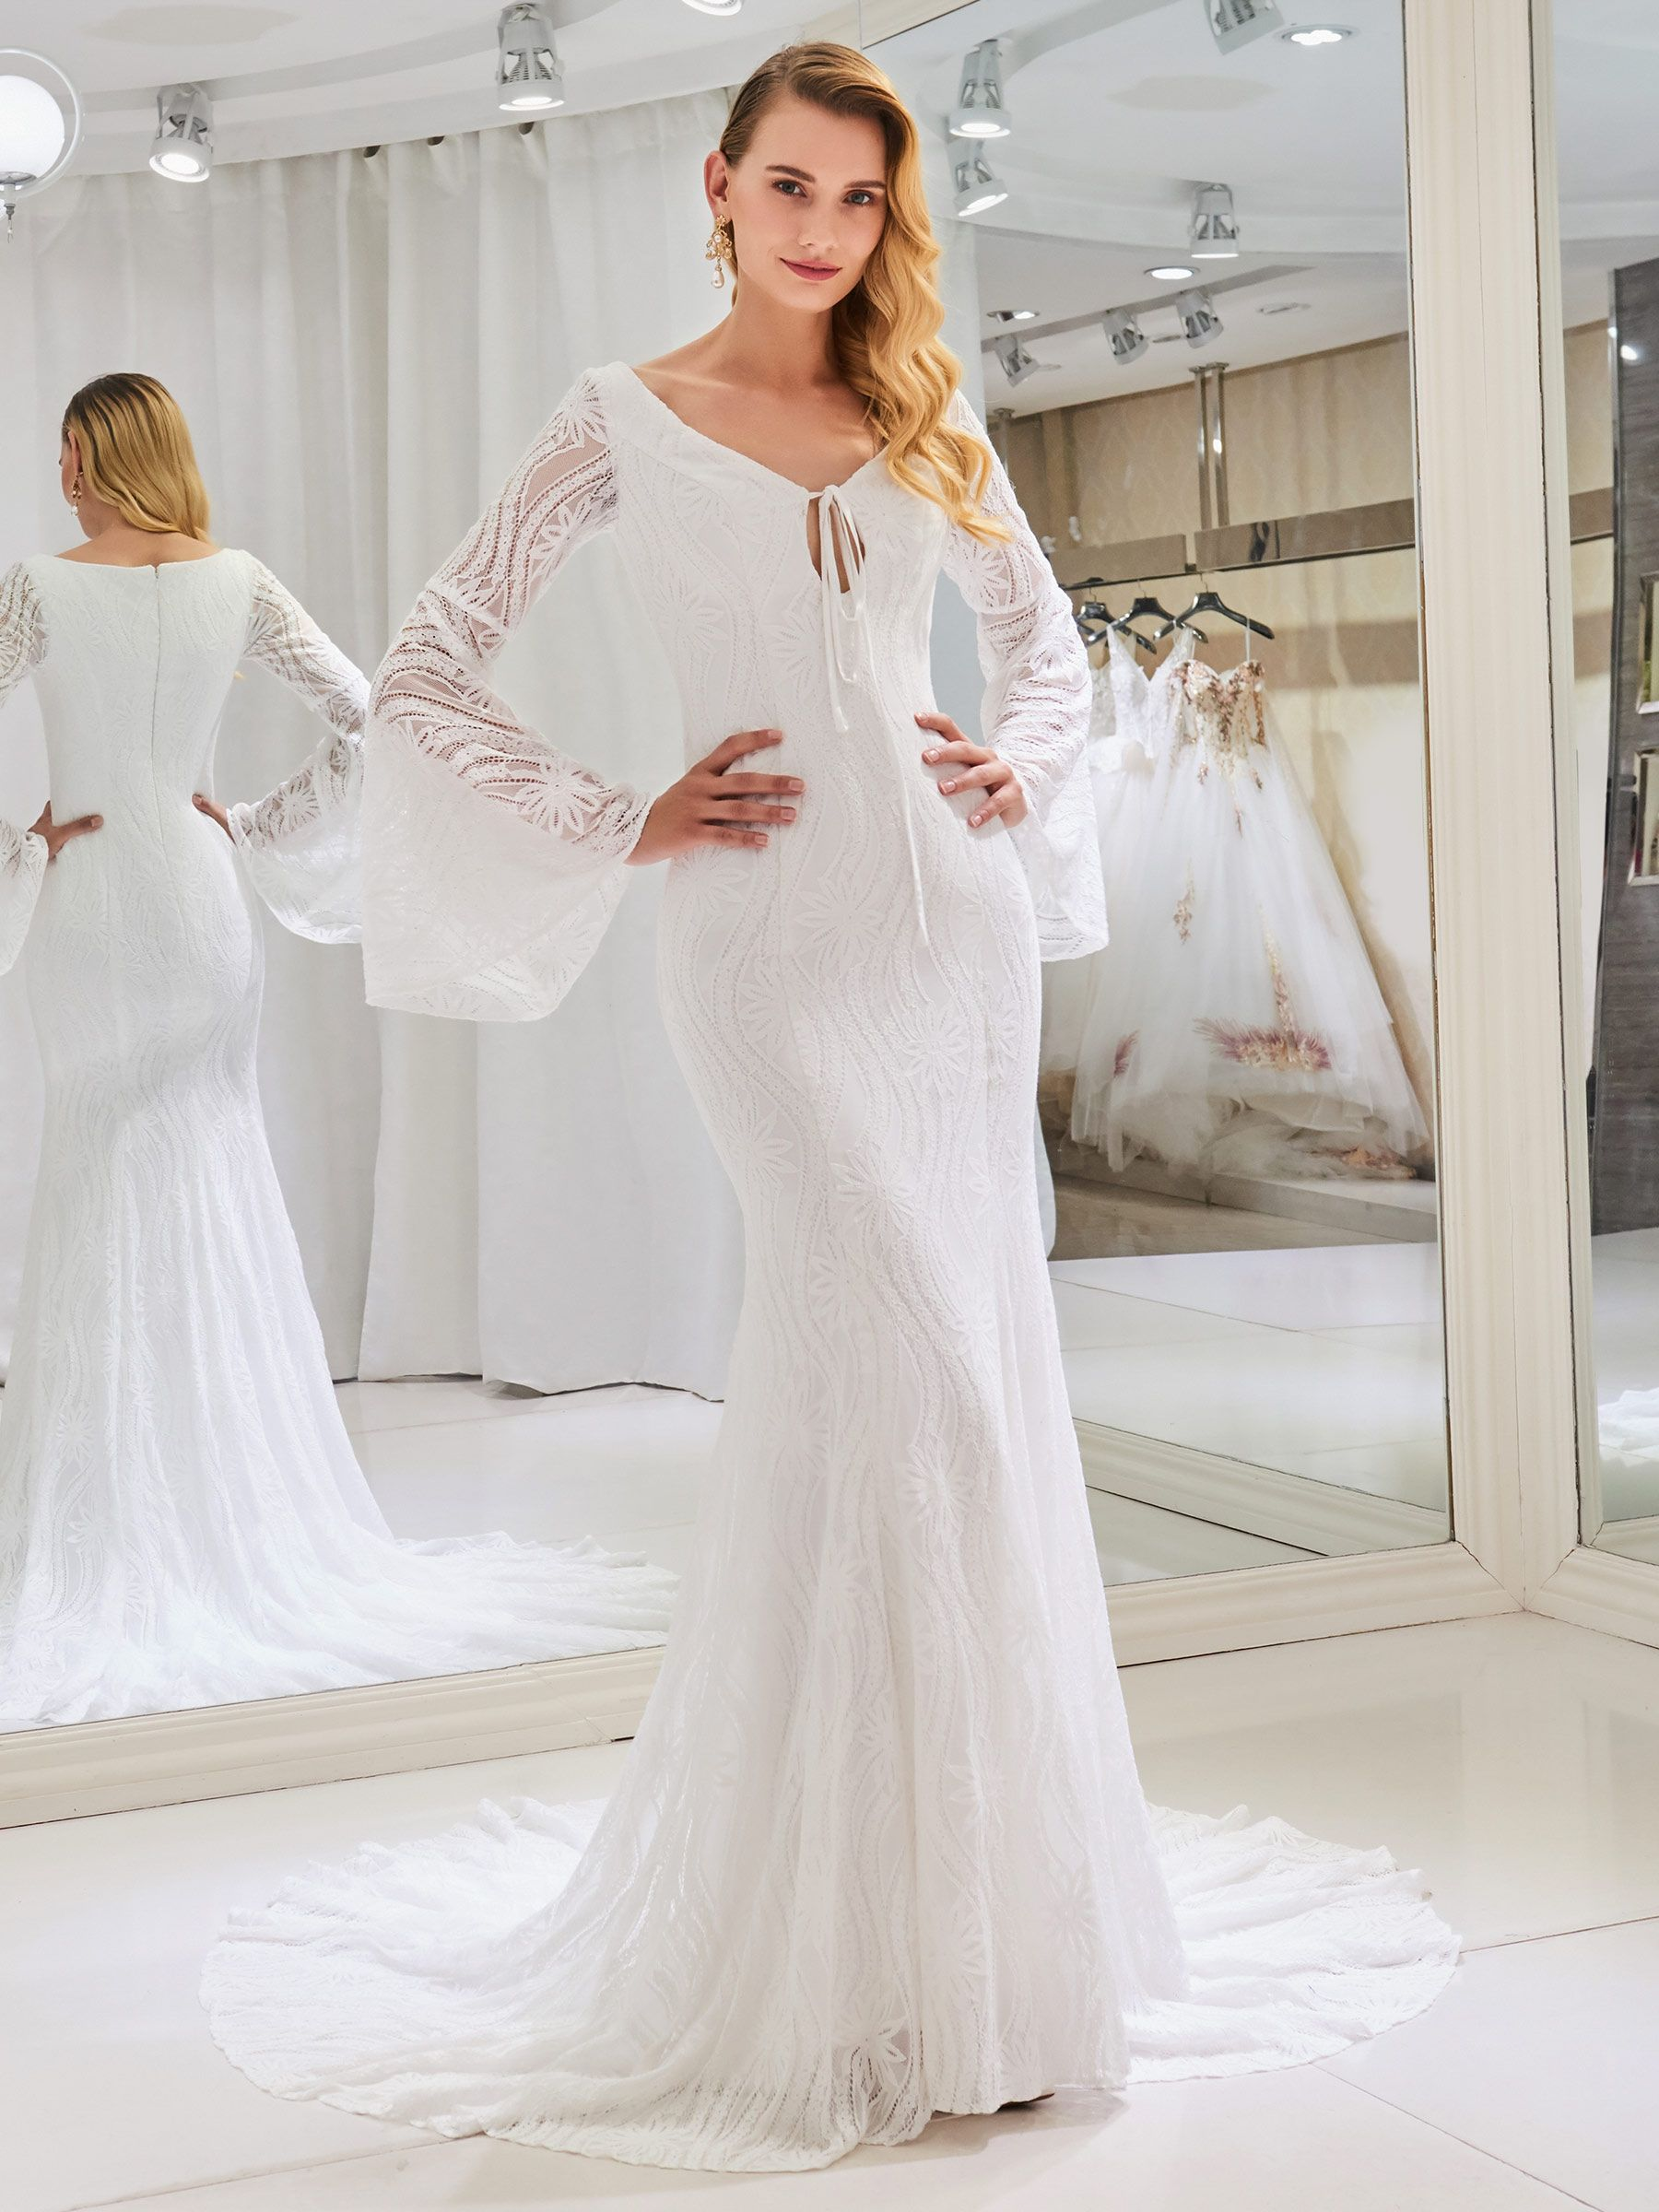 VNeck Mermaid Lace Wedding Dress with Long Sleeve Evlilik zamanı